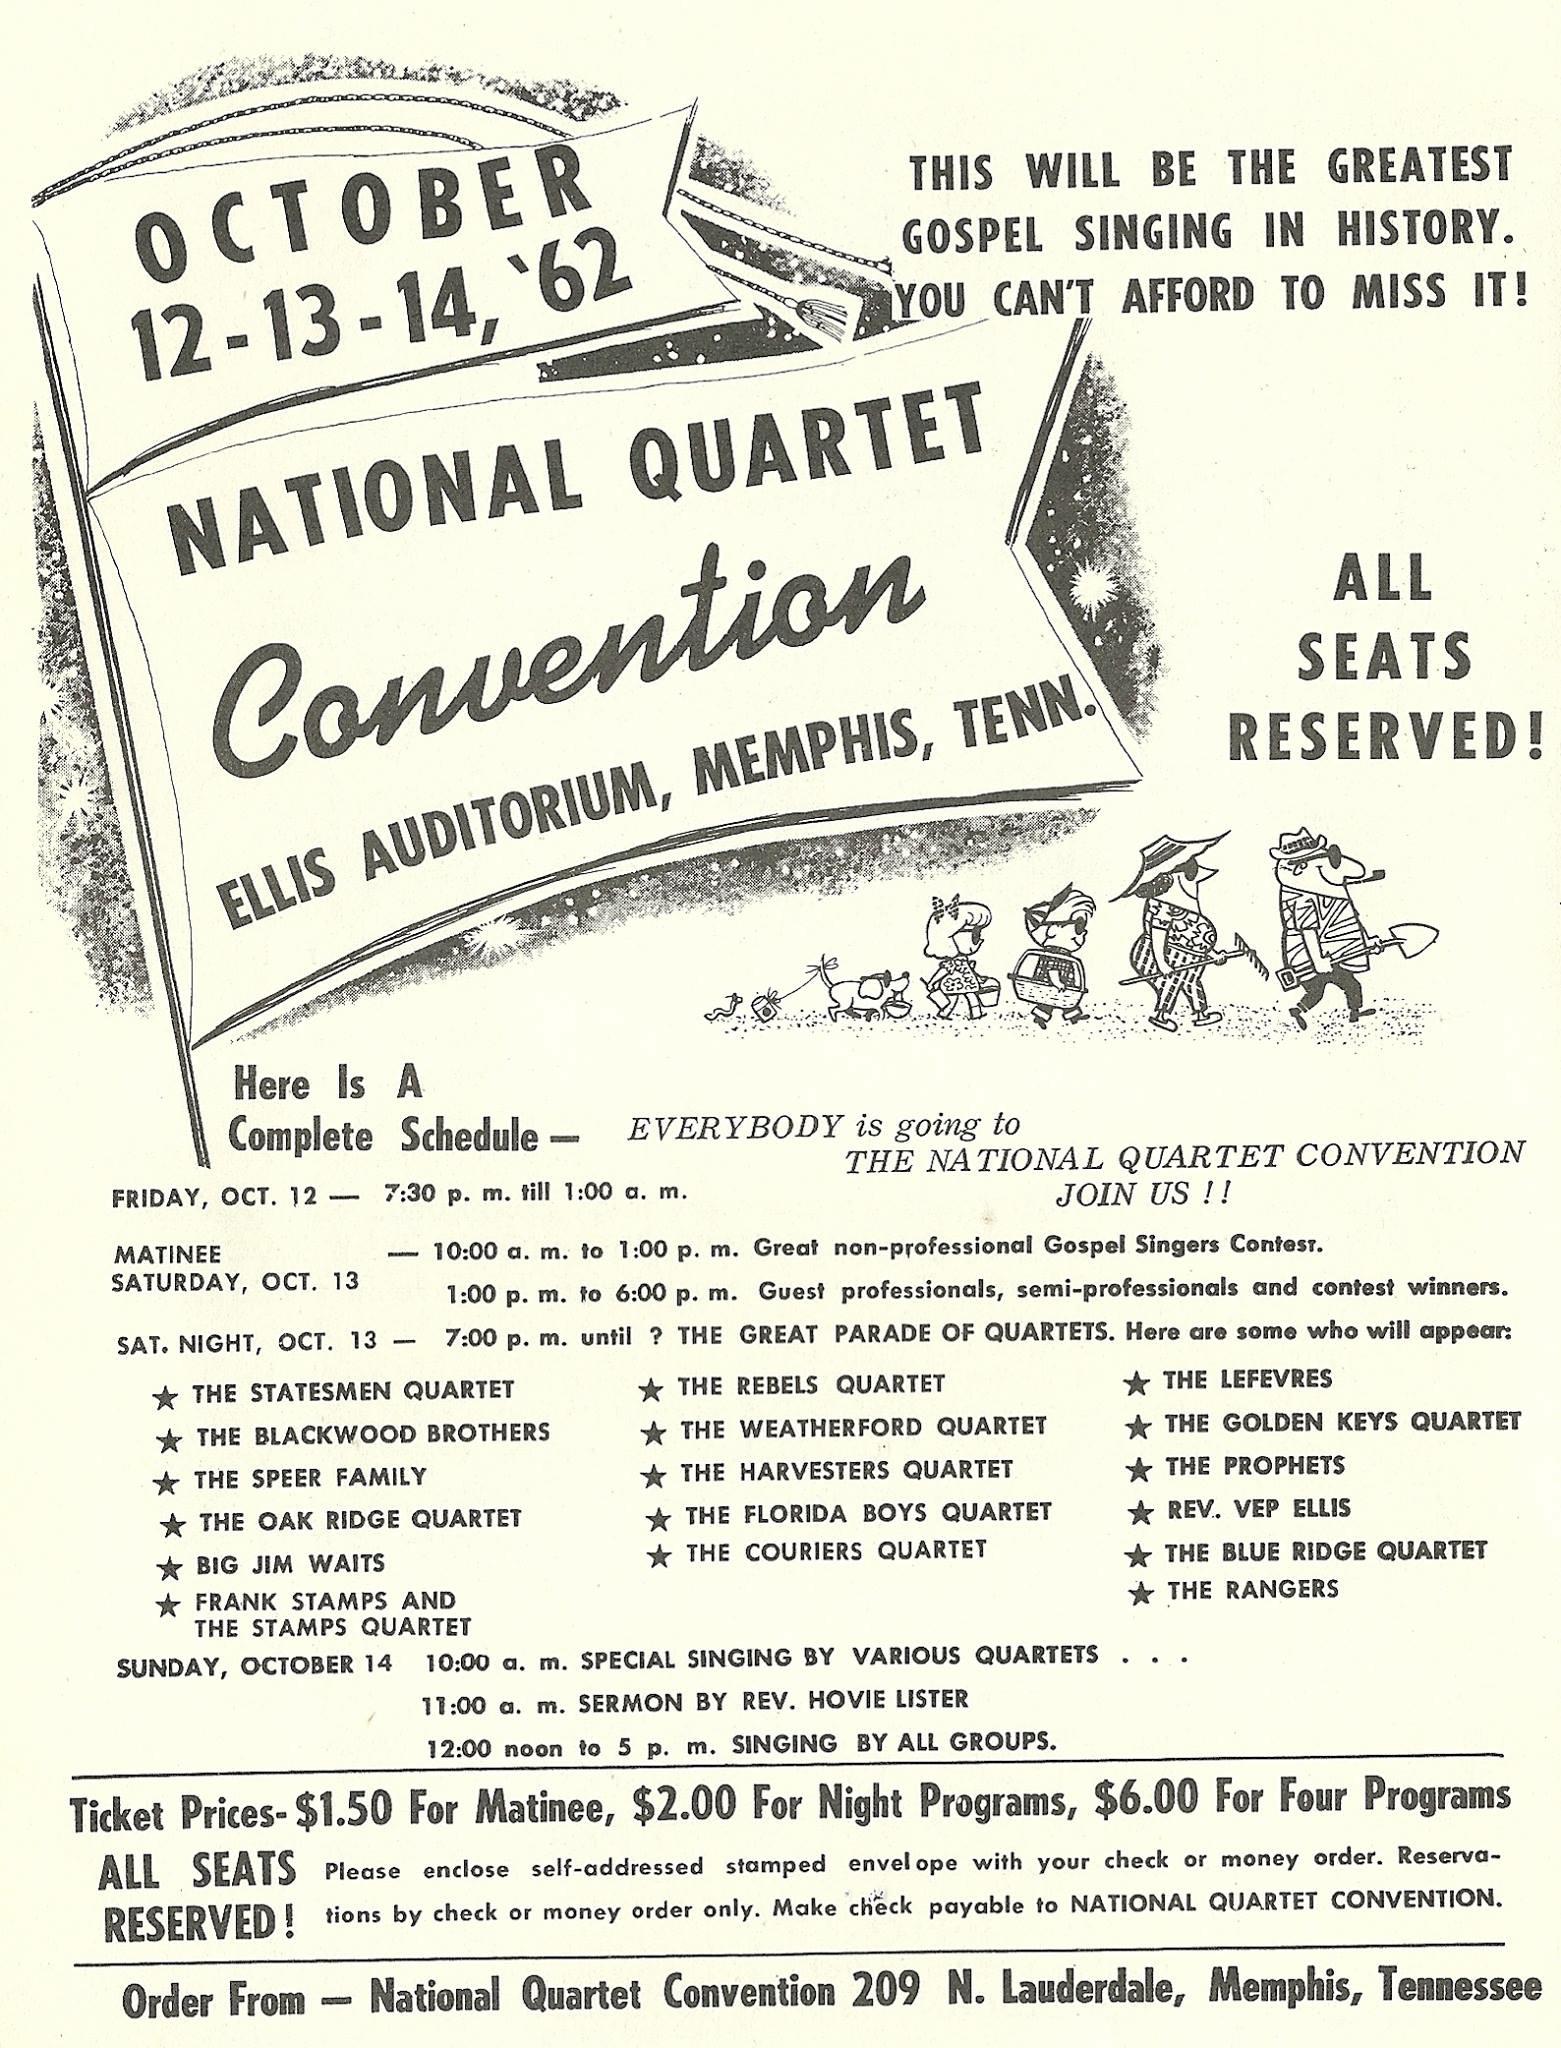 nqc 1962